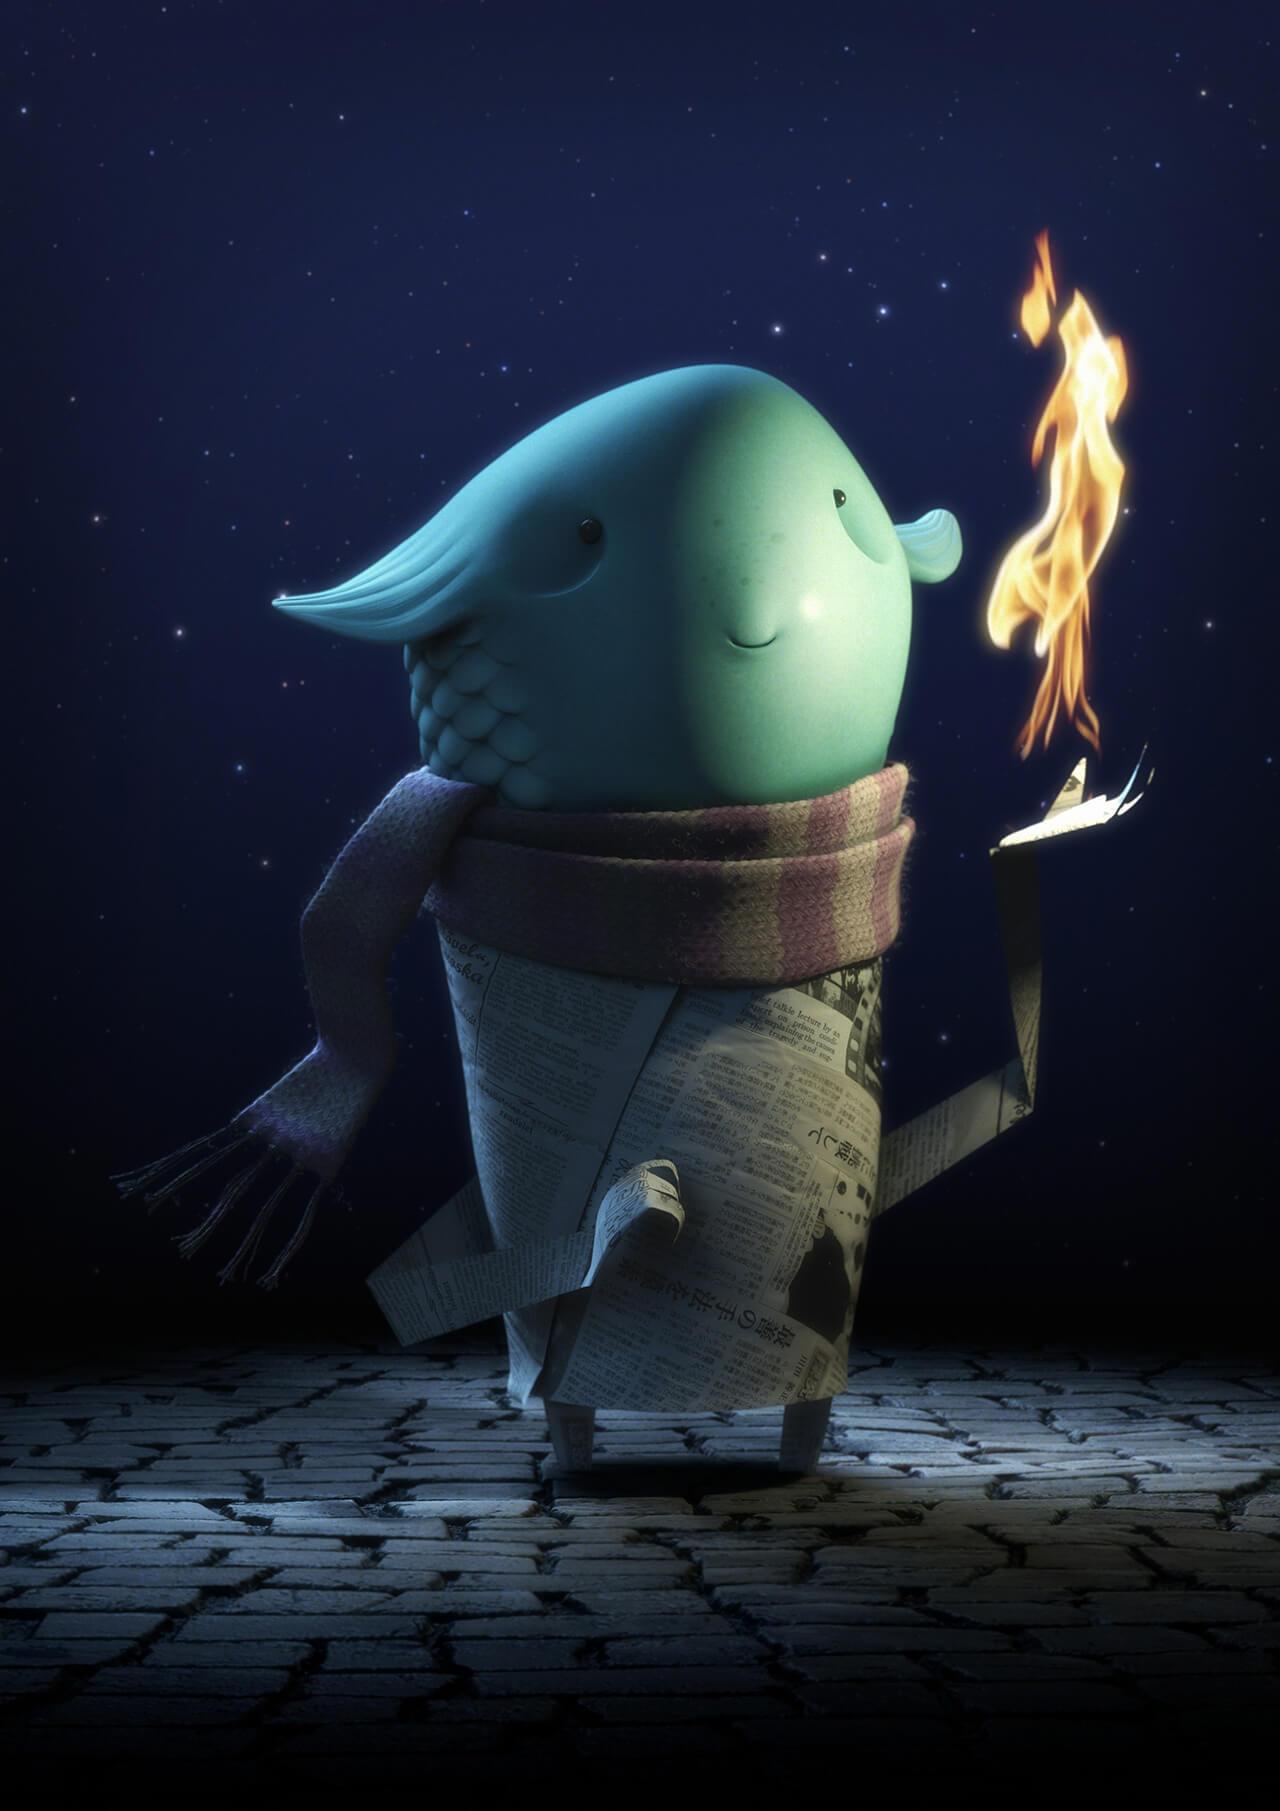 Computer generated fish character image